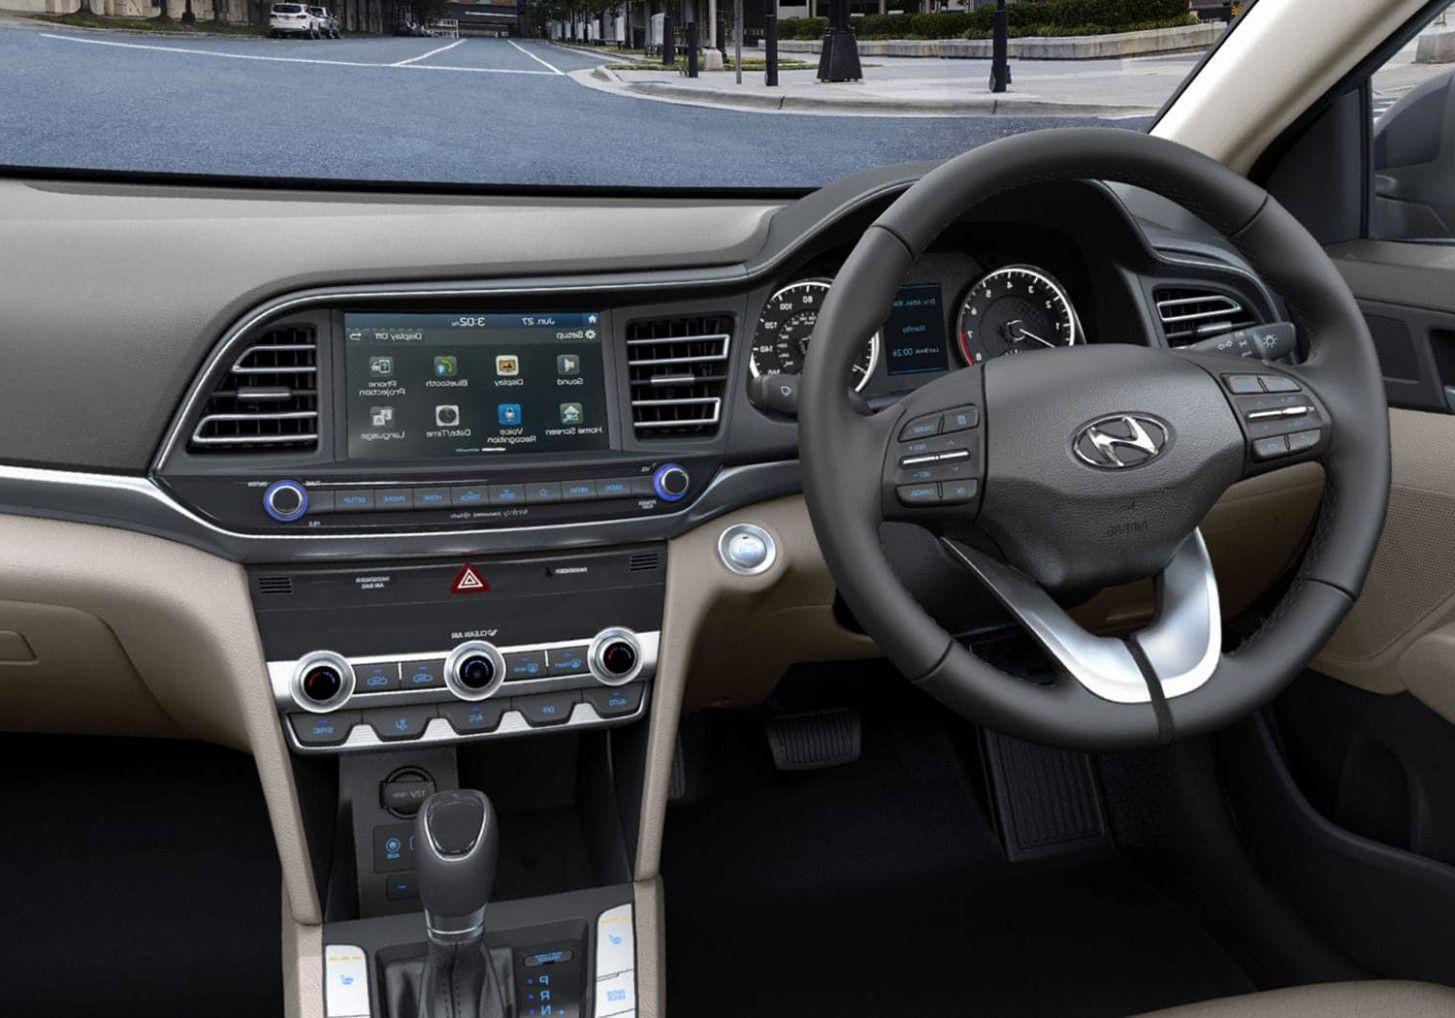 15 Taboos About 2020 Hyundai Elantra Value Edition You Should Never Share On Twitter Elantra Hyundai Elantra Hyundai